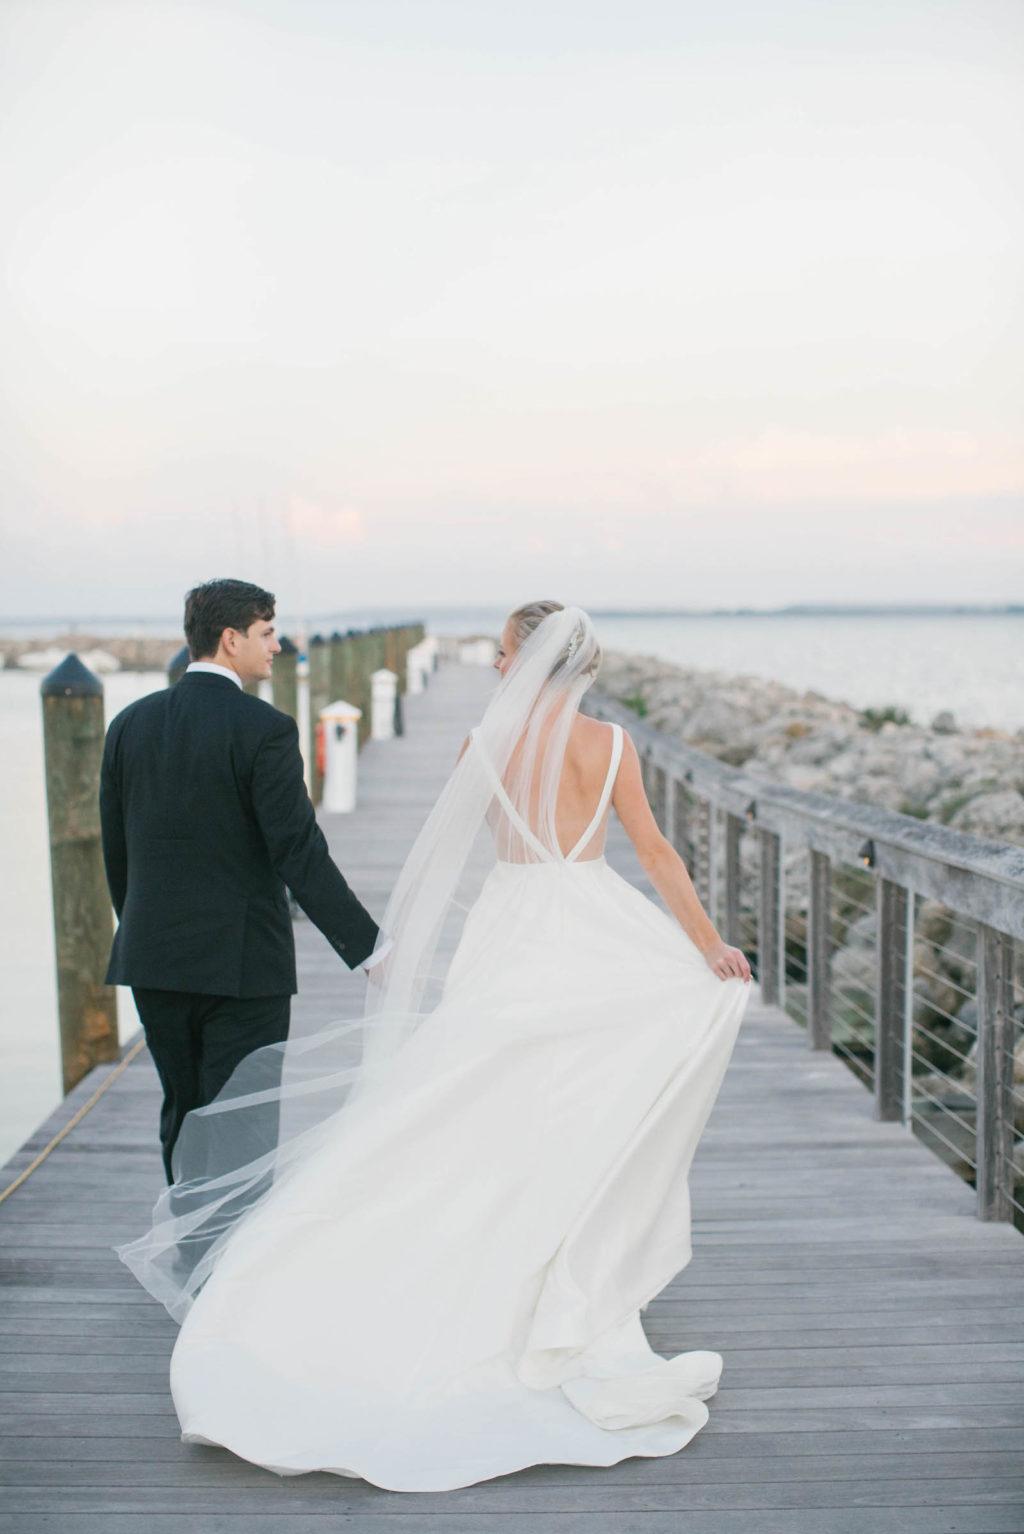 Bride and Groom Veil Shot Wedding Portrait | Bride in BHLDN Illusion Back Wedding Dress Ballgown | South Tampa Wedding Photos